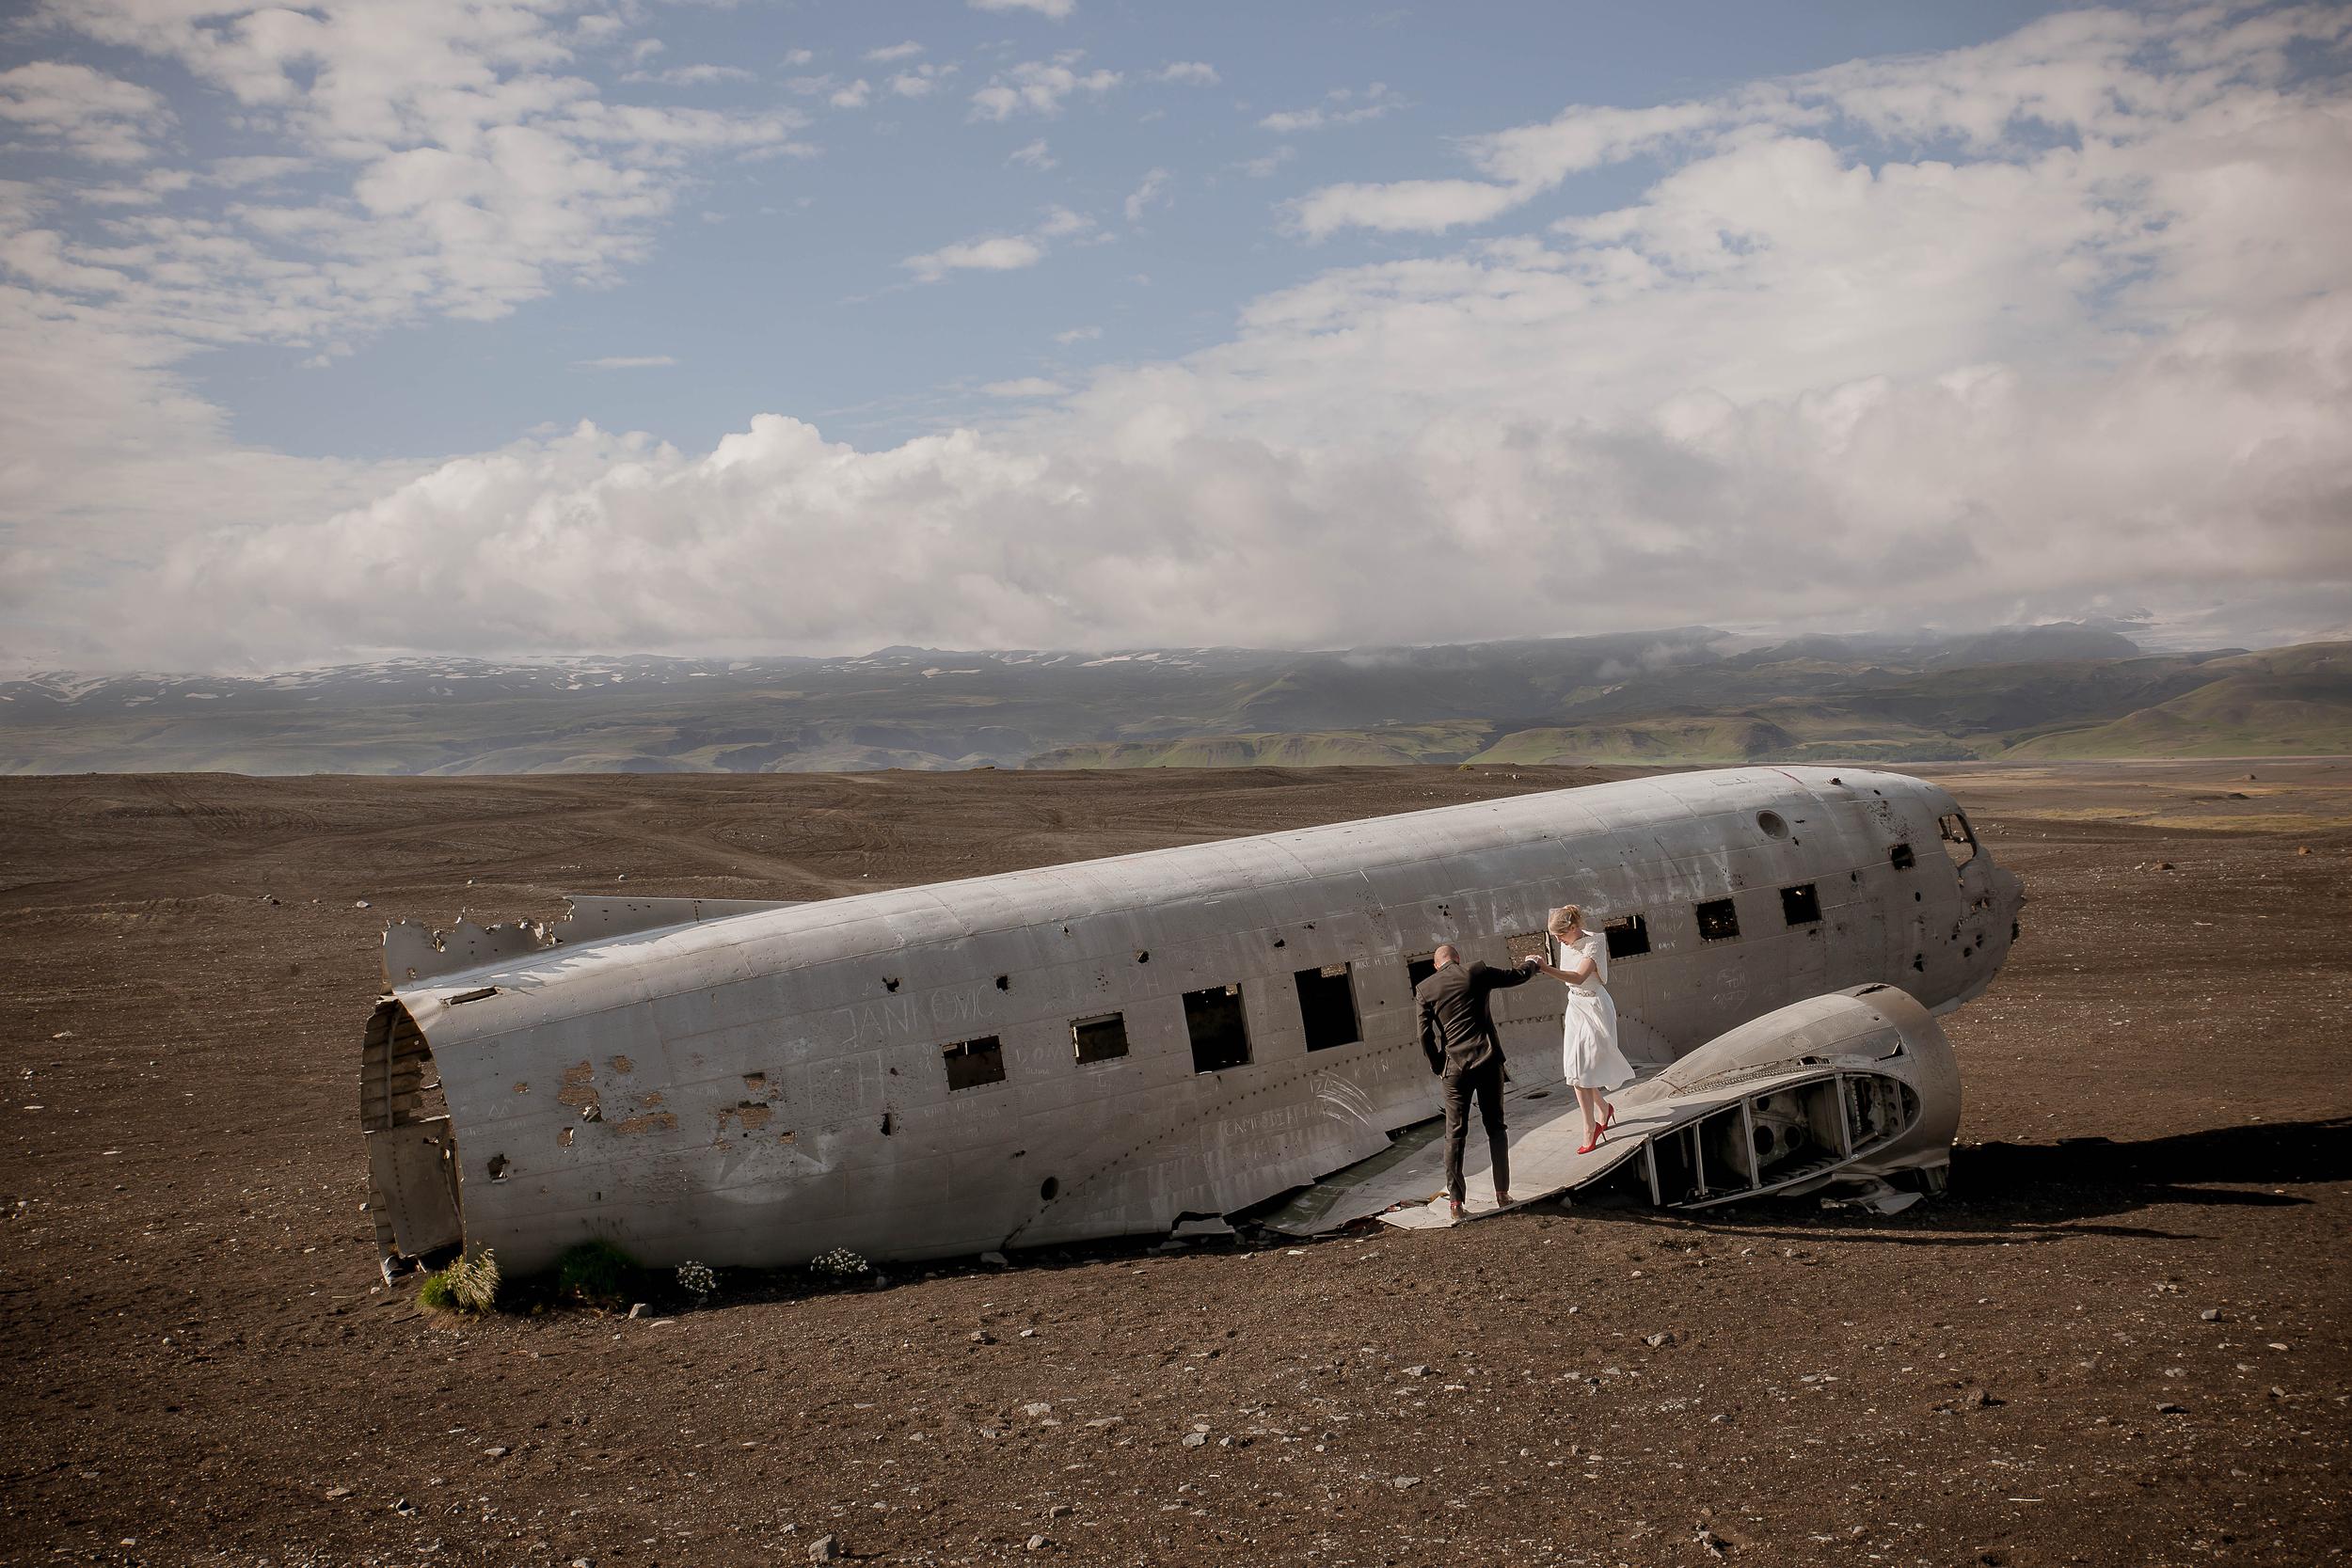 Iceland Crashed Airplane Wedding Photos by Miss Ann-2.jpg